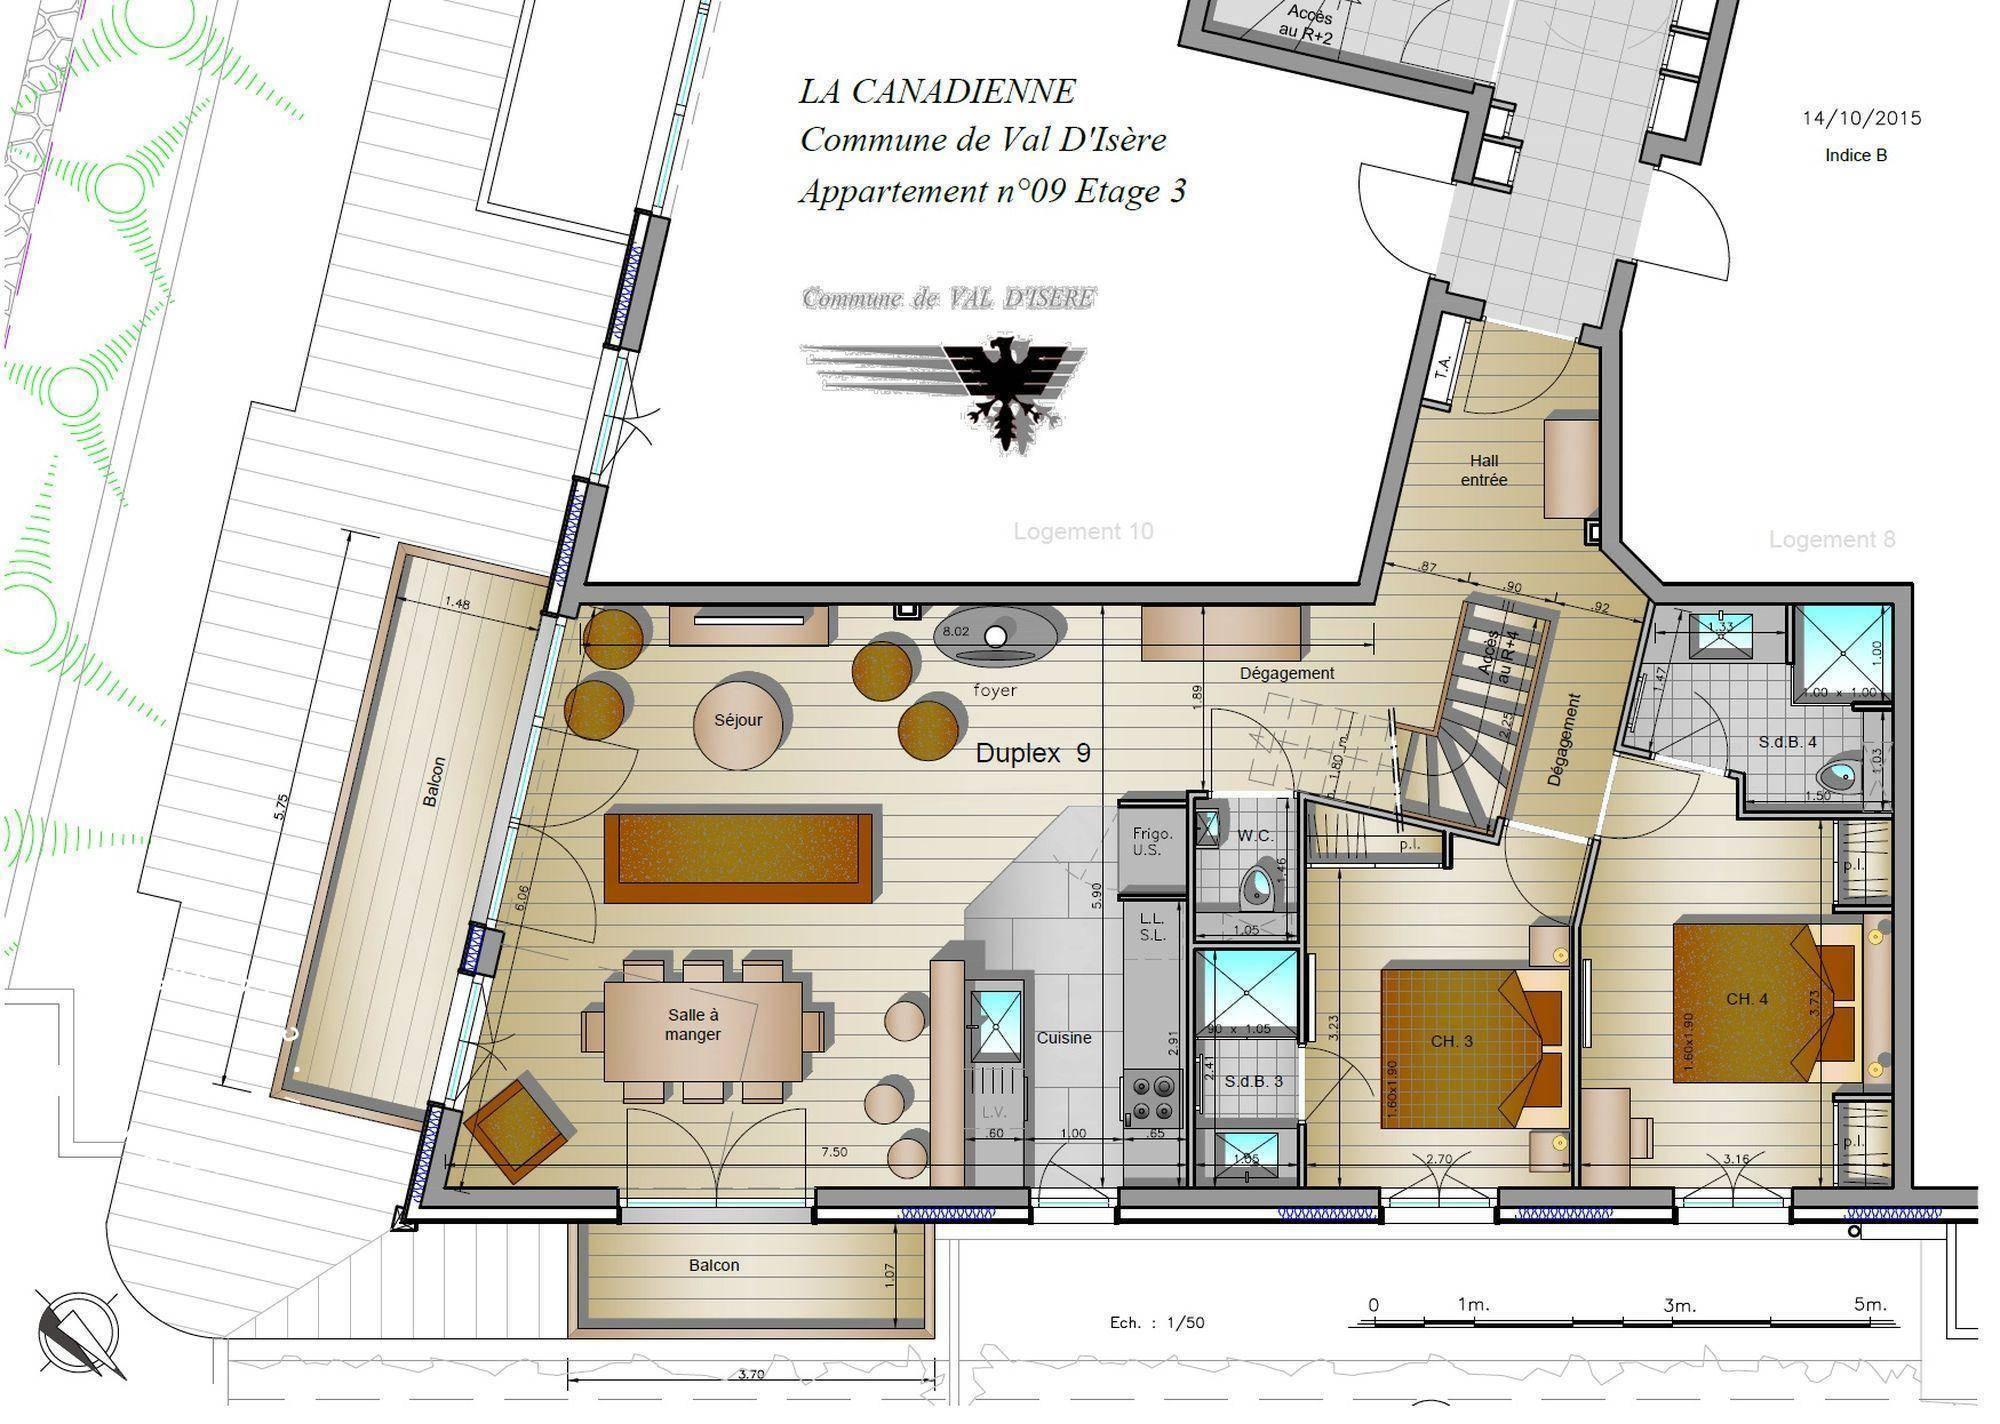 Chalet Caribou – La Canadienne Residence Val d'Isere Floor Plan 1